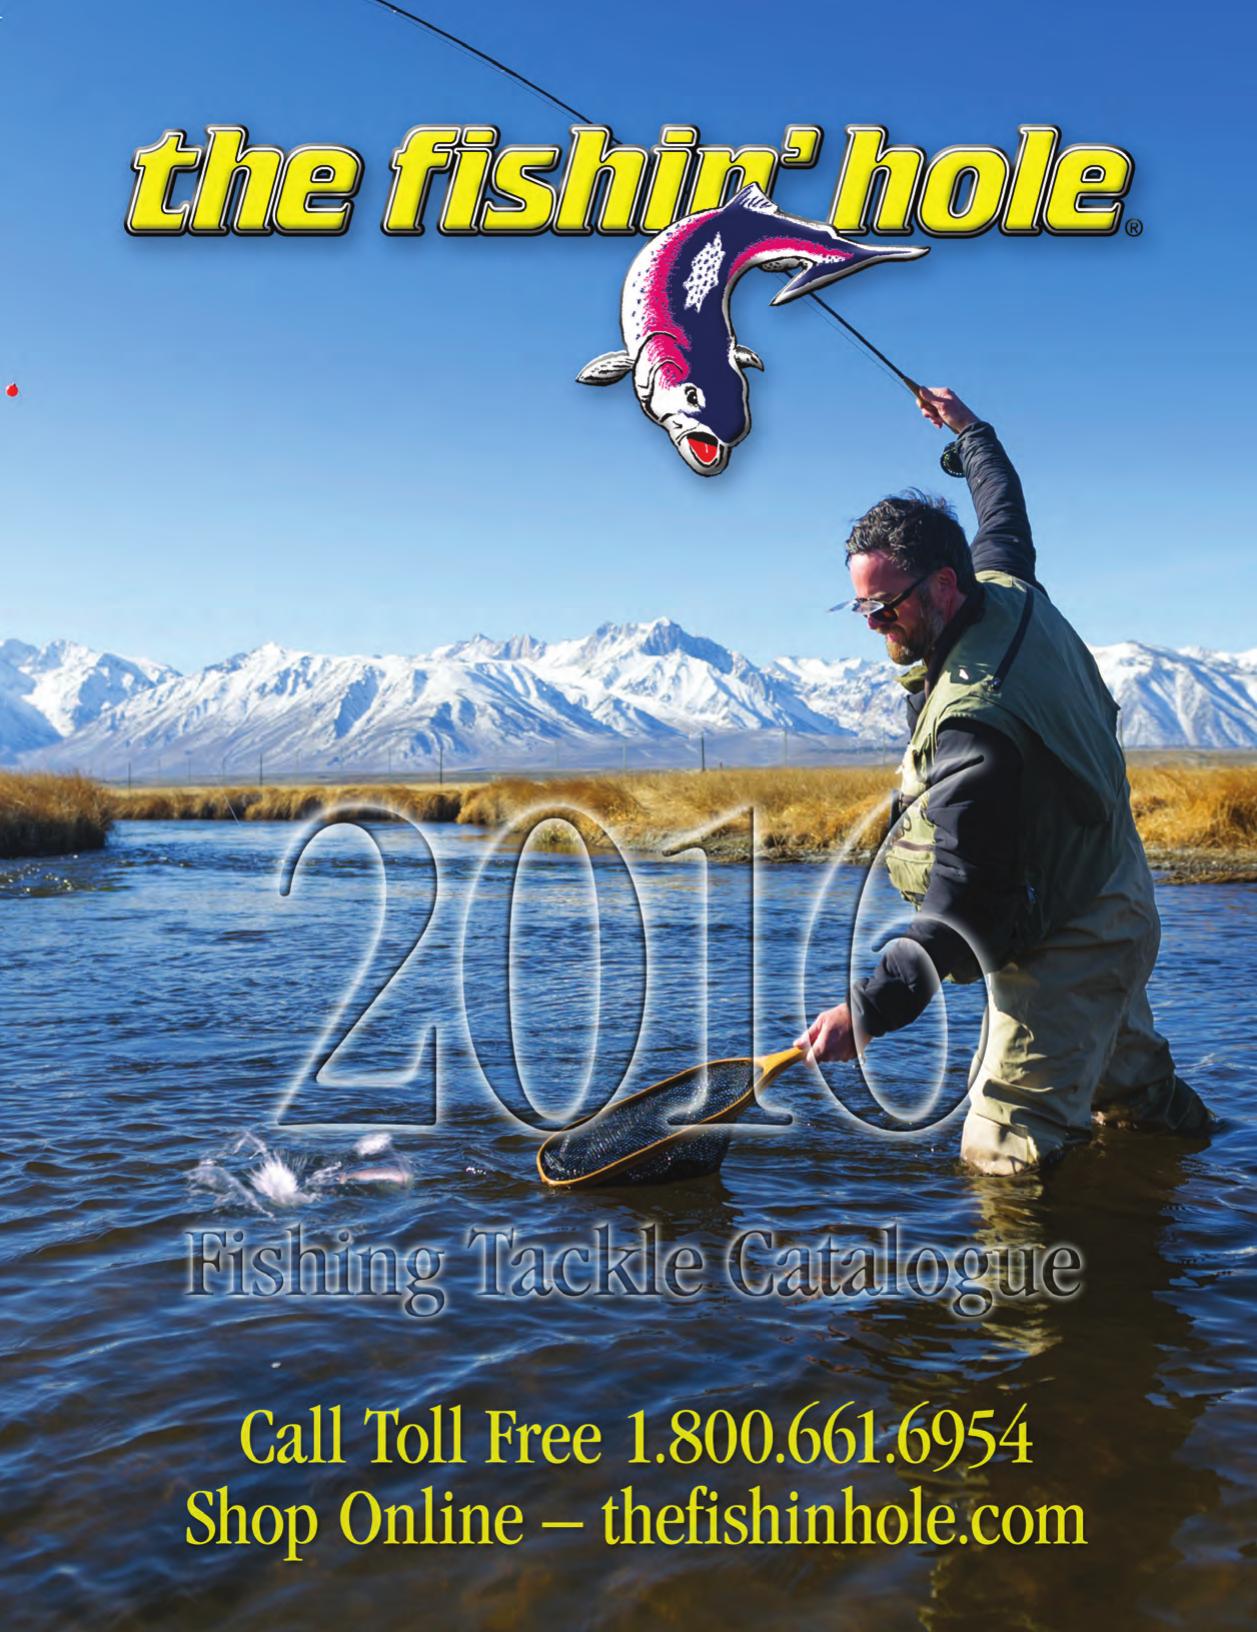 Gibbs 1//2 oz #12 Nickel Green Minnow Jig Fishing Lure Trout Salmon Steelhead